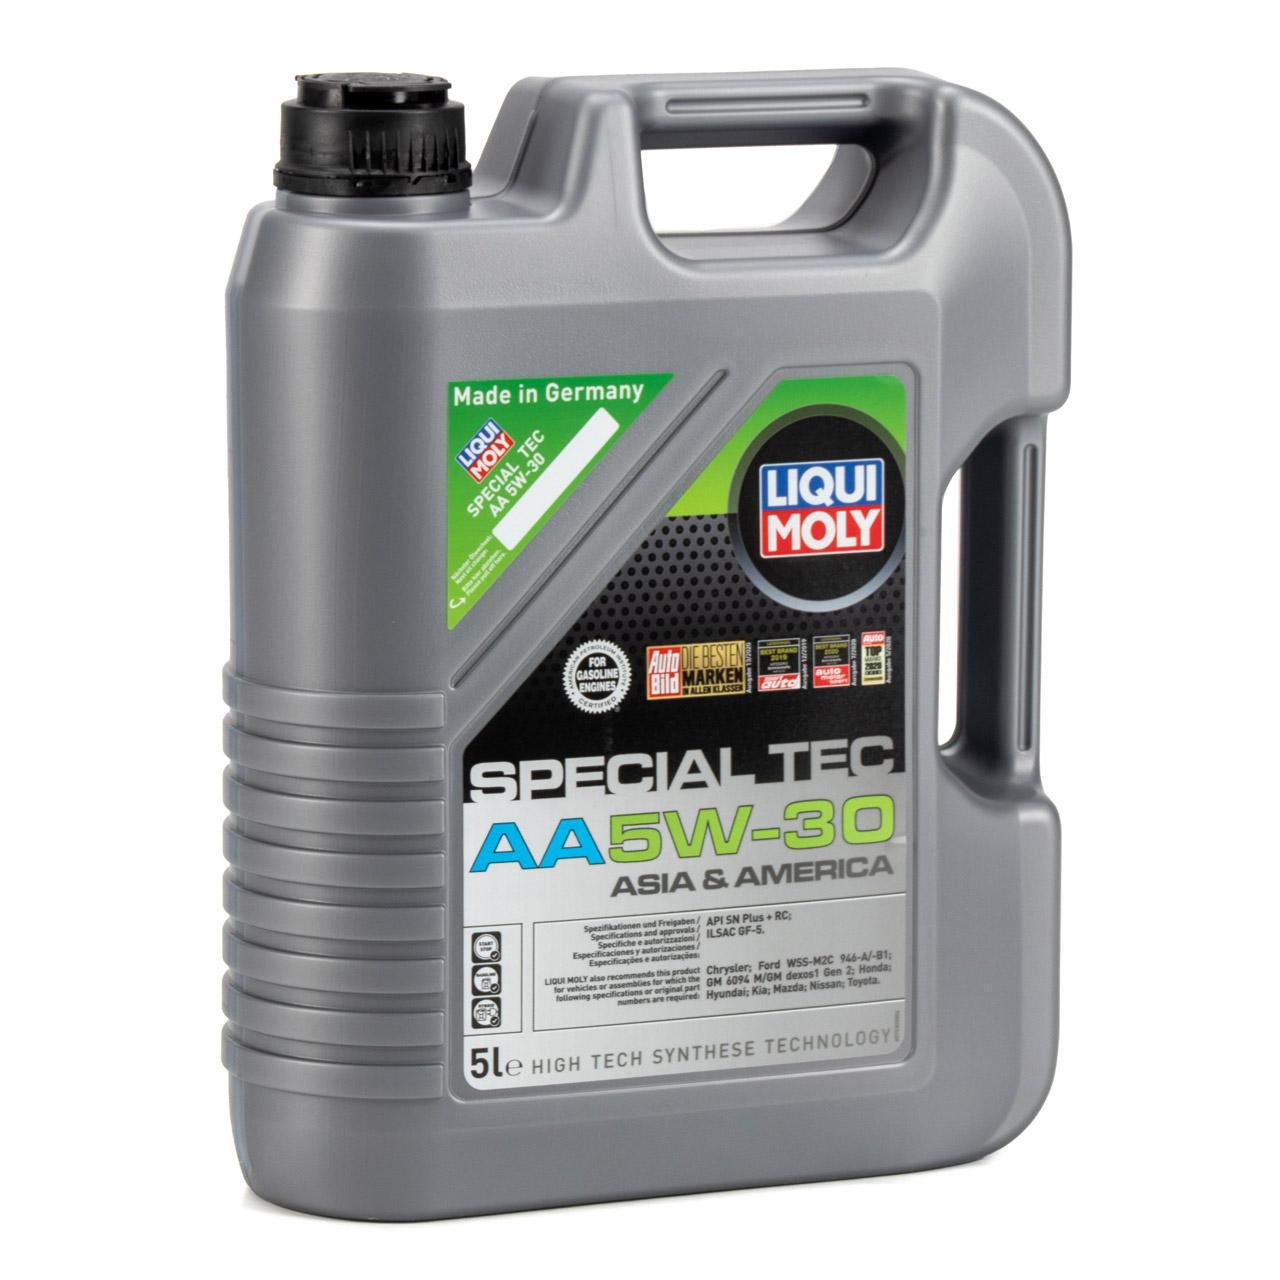 LIQUI MOLY 20954 Motoröl Öl SPECIAL TEC AA 5W-30 ASIA & AMERICA - 5L 5 Liter